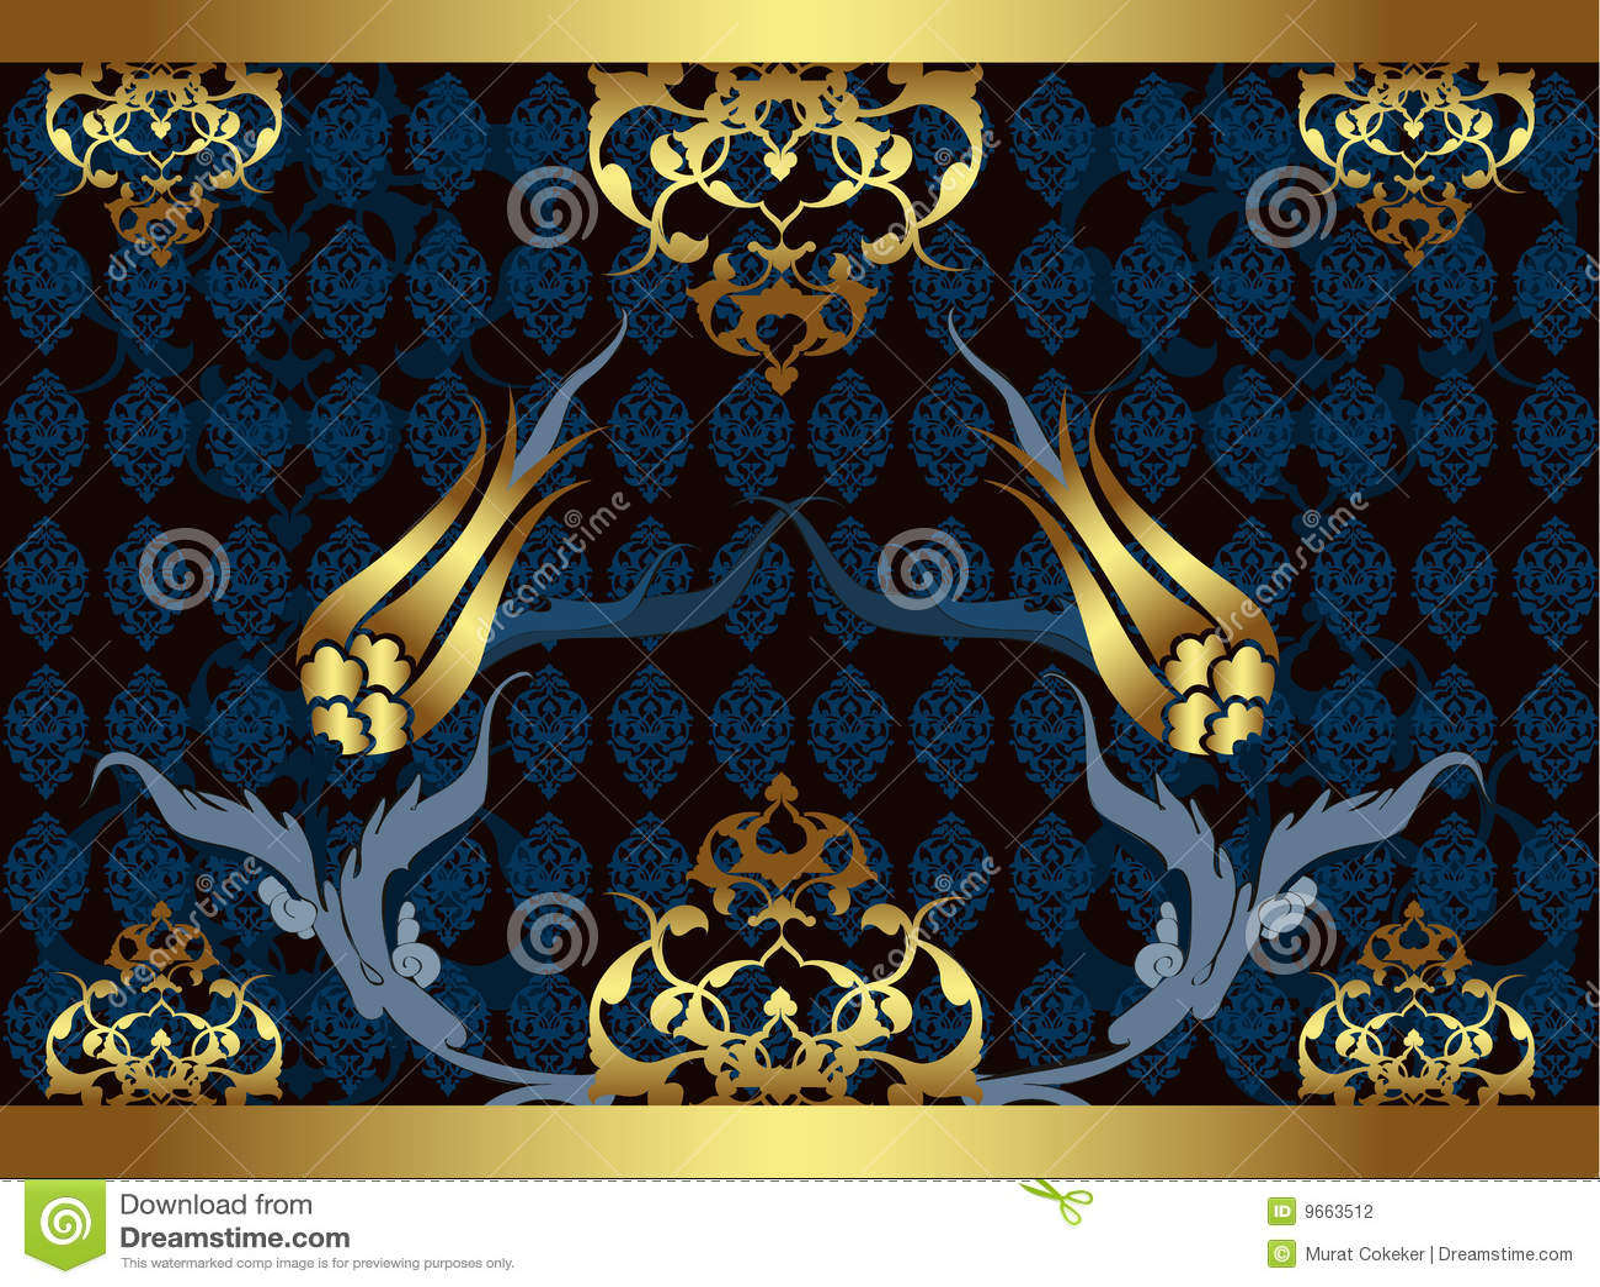 Elegant Golden Traditional Ottoman Turkish Design Stock ...